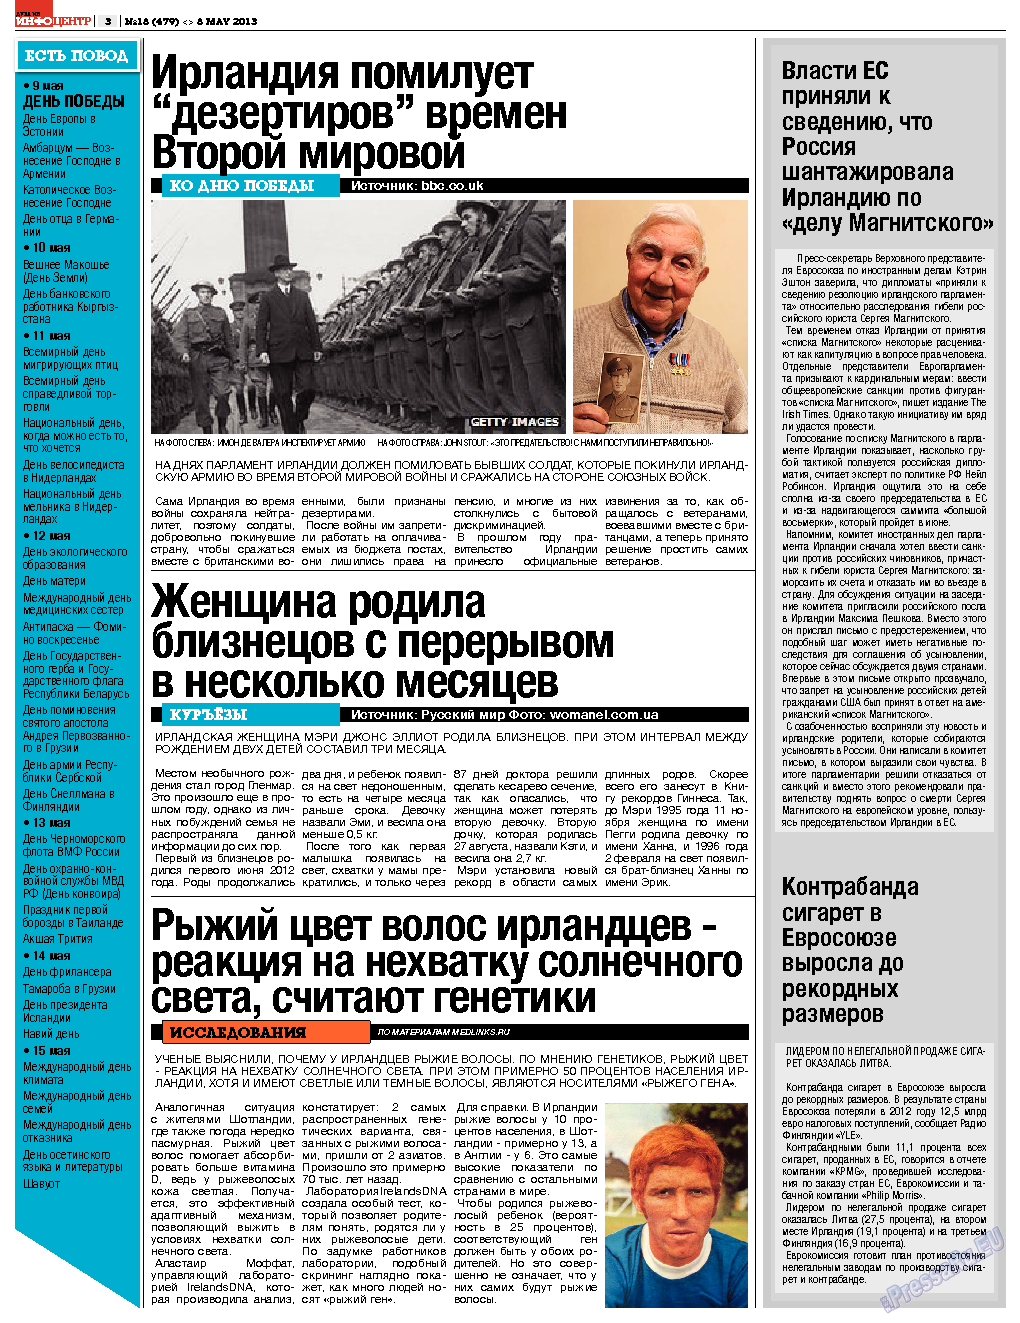 Дублин инфоцентр (газета). 2013 год, номер 18, стр. 3